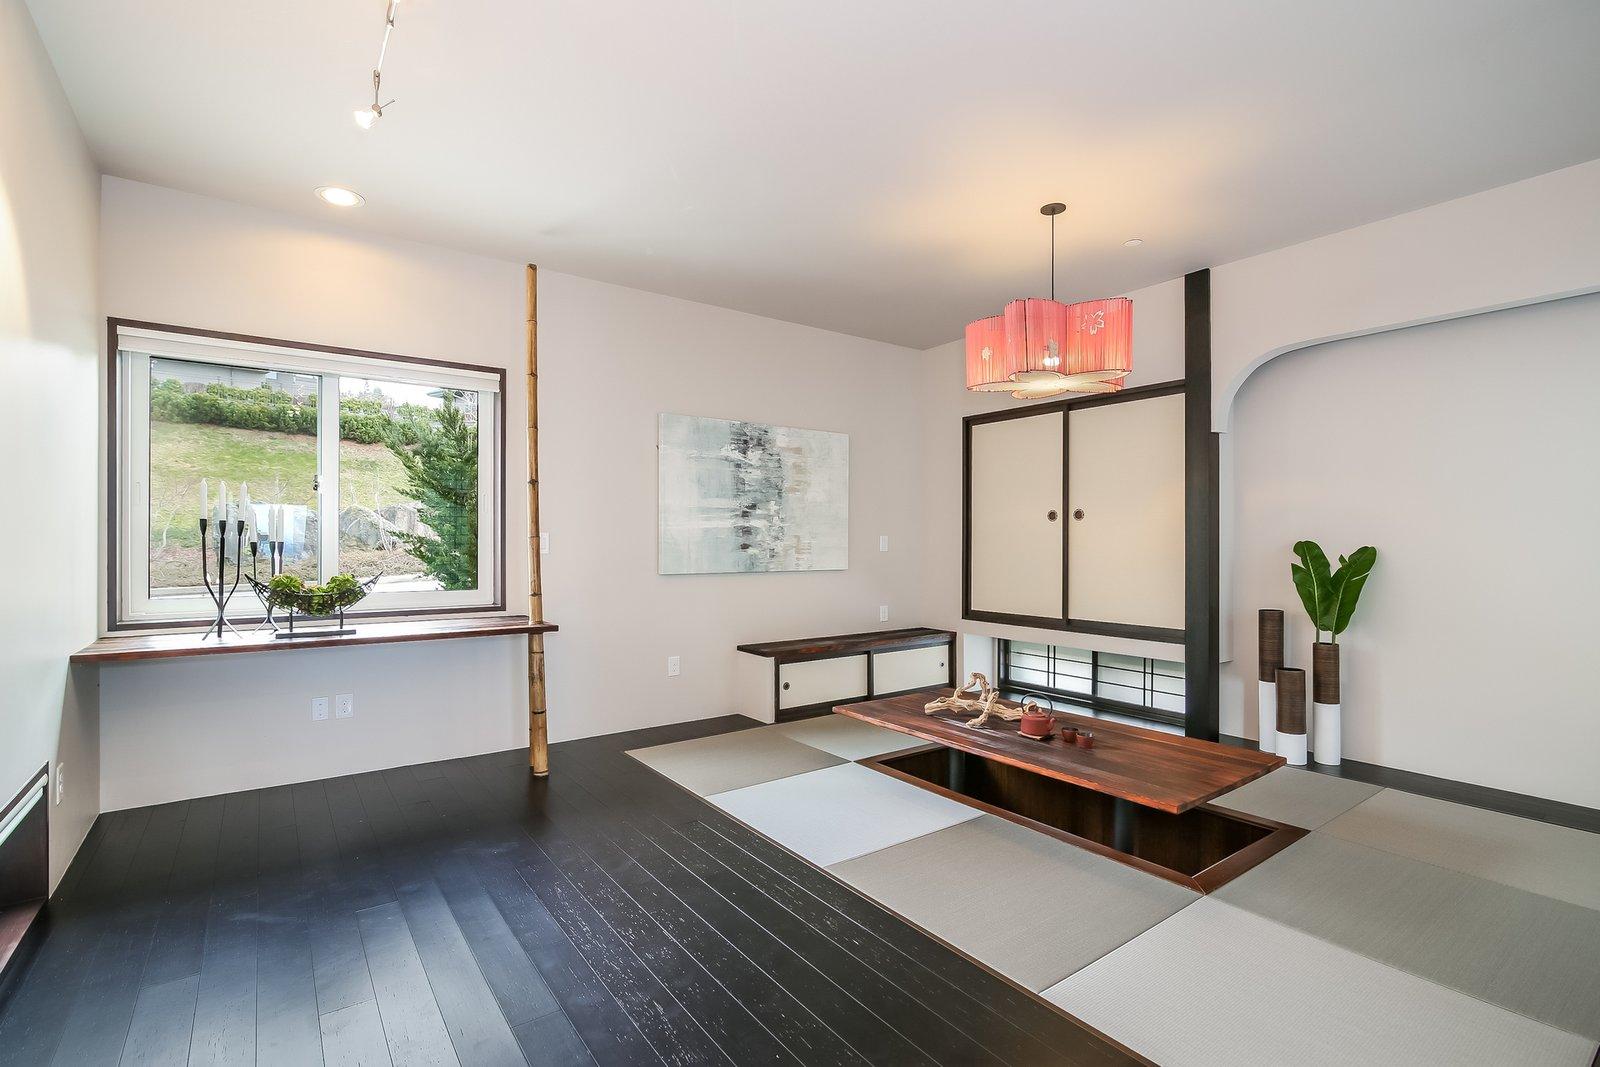 Living Room, Dark Hardwood Floor, and Pendant Lighting  Japanese Builder Ichijo Creates Net-Zero Energy Home by PlanOmatic